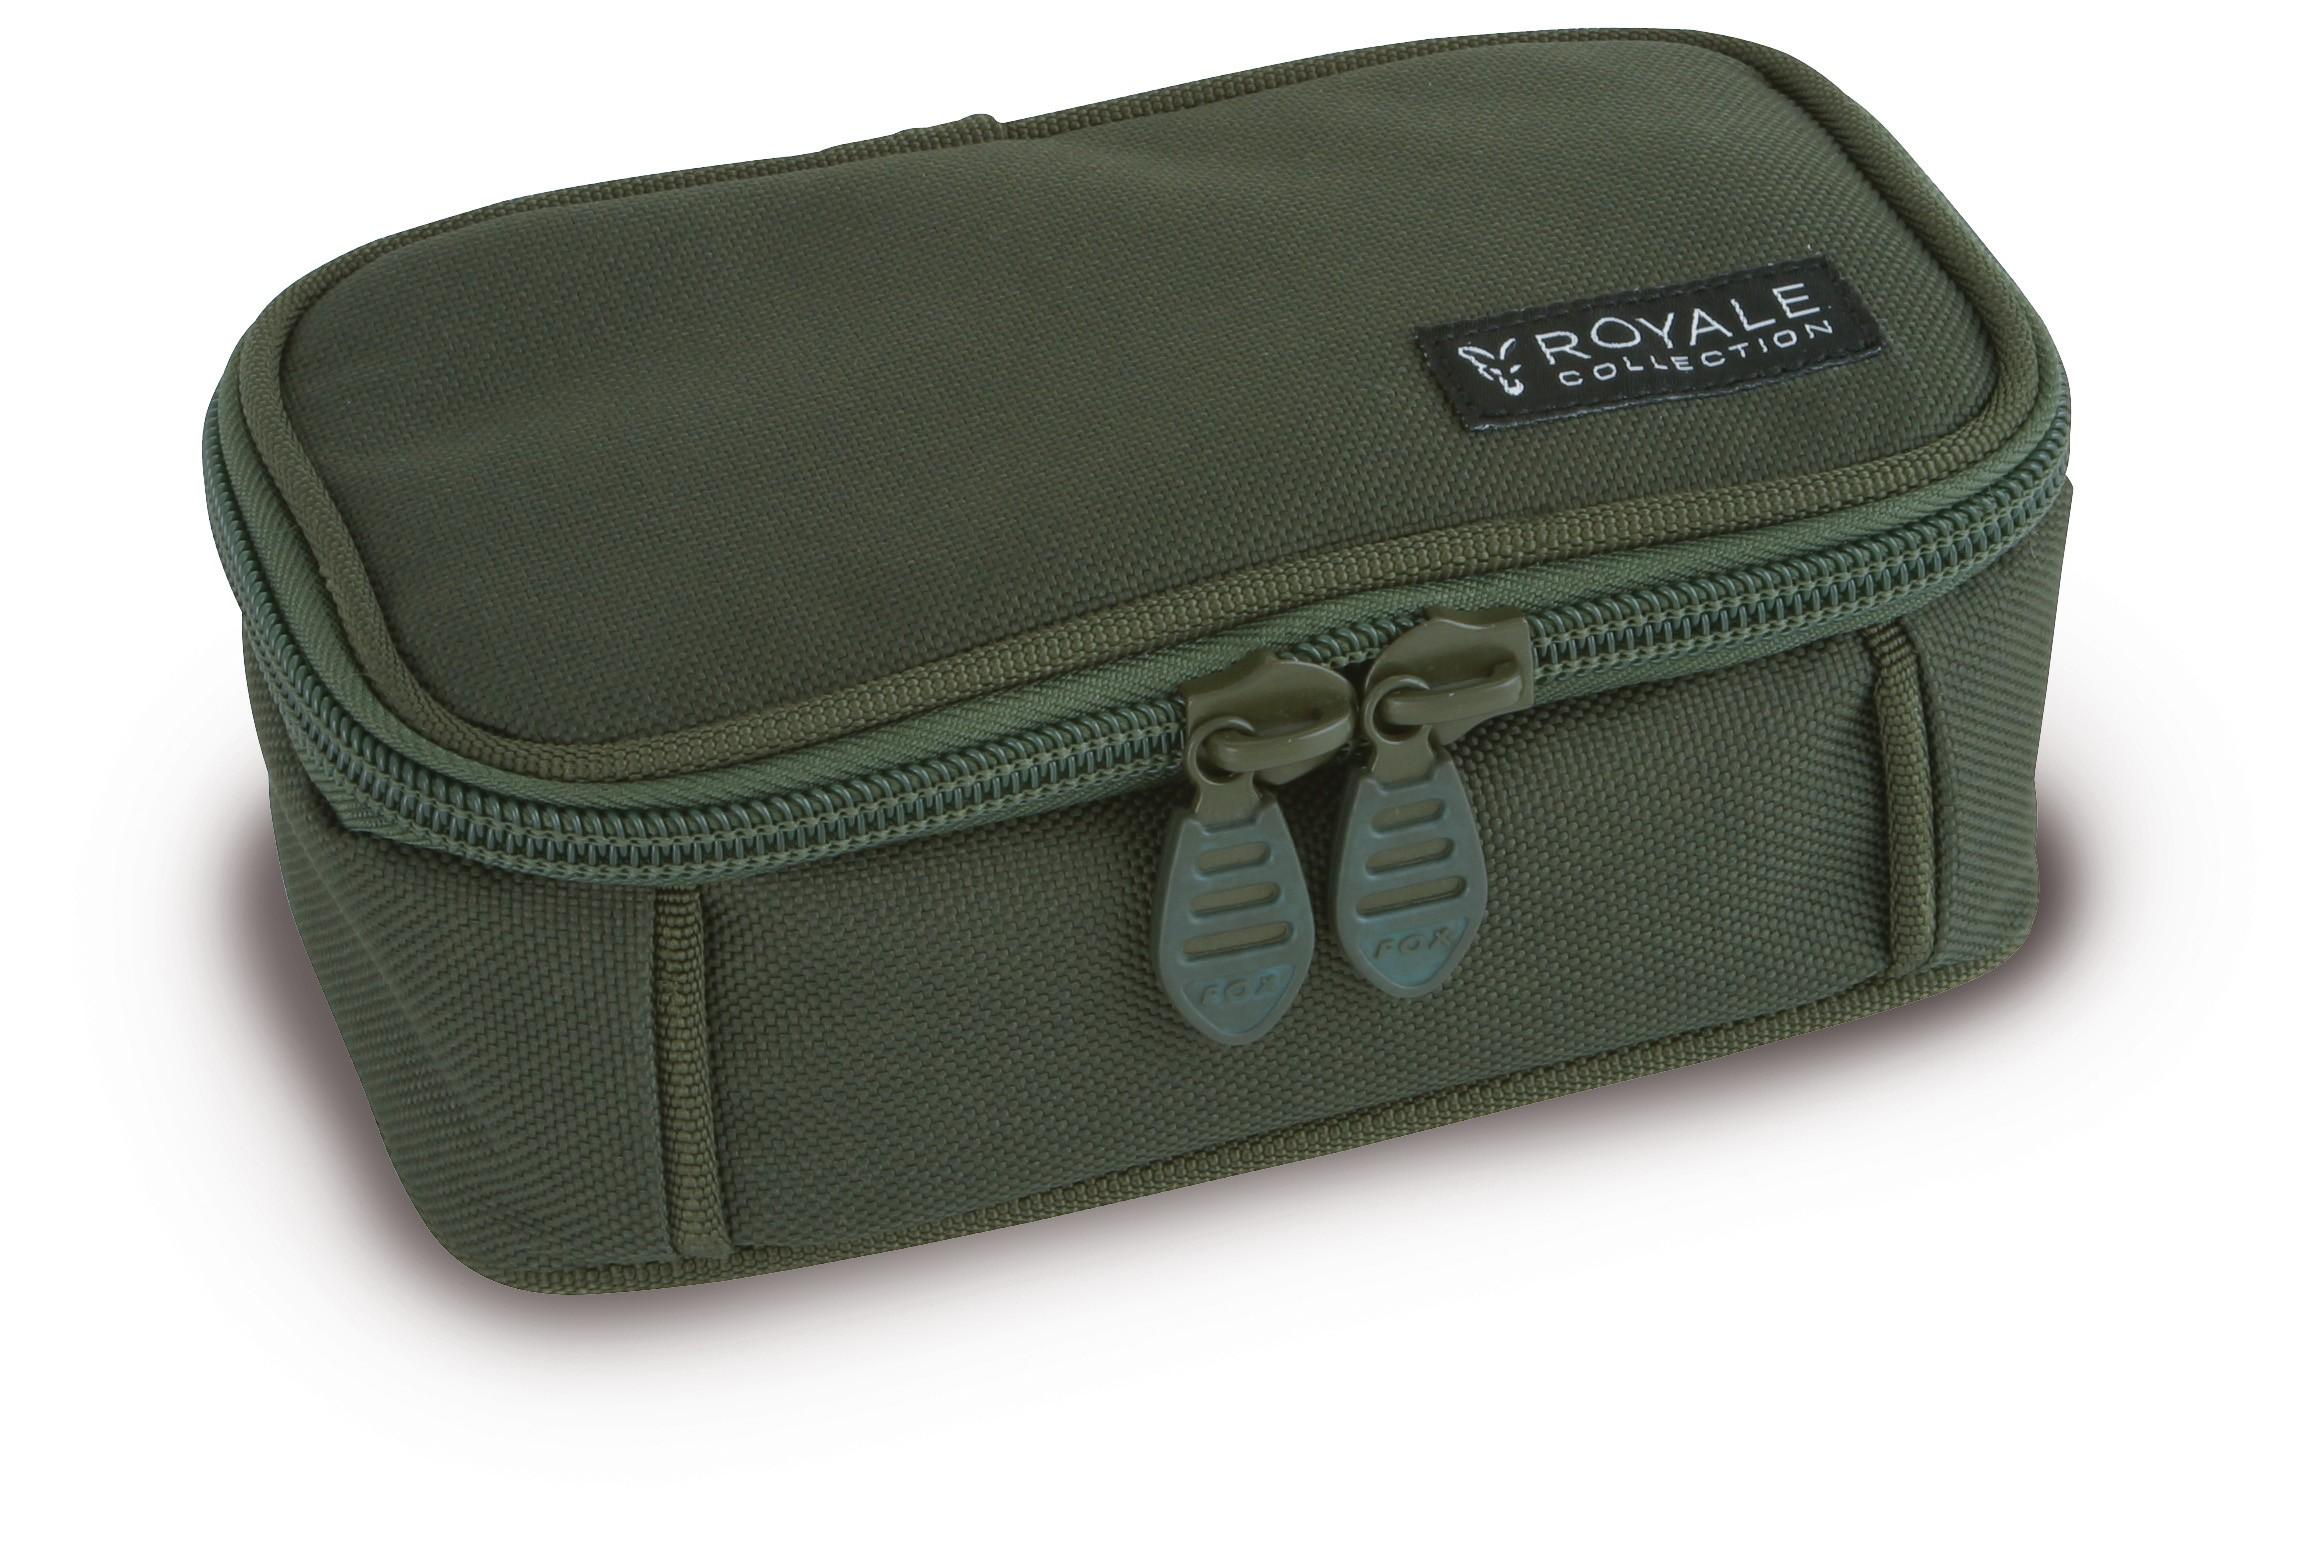 Fox Royale Accessory Bag Medium